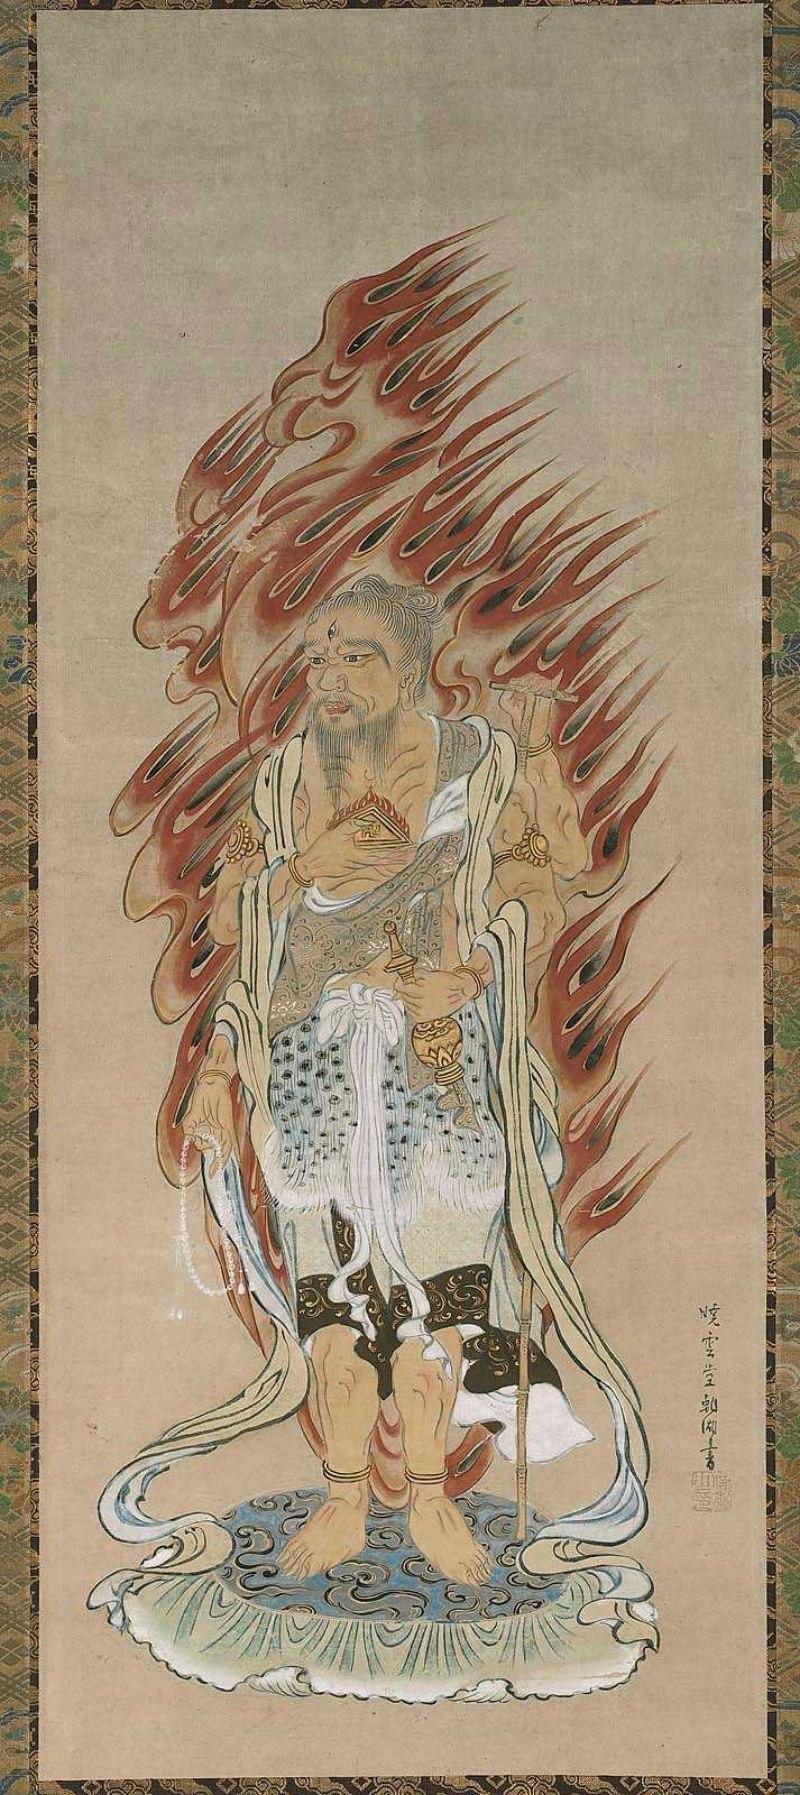 Hanabusa Katen, the Fire Deity